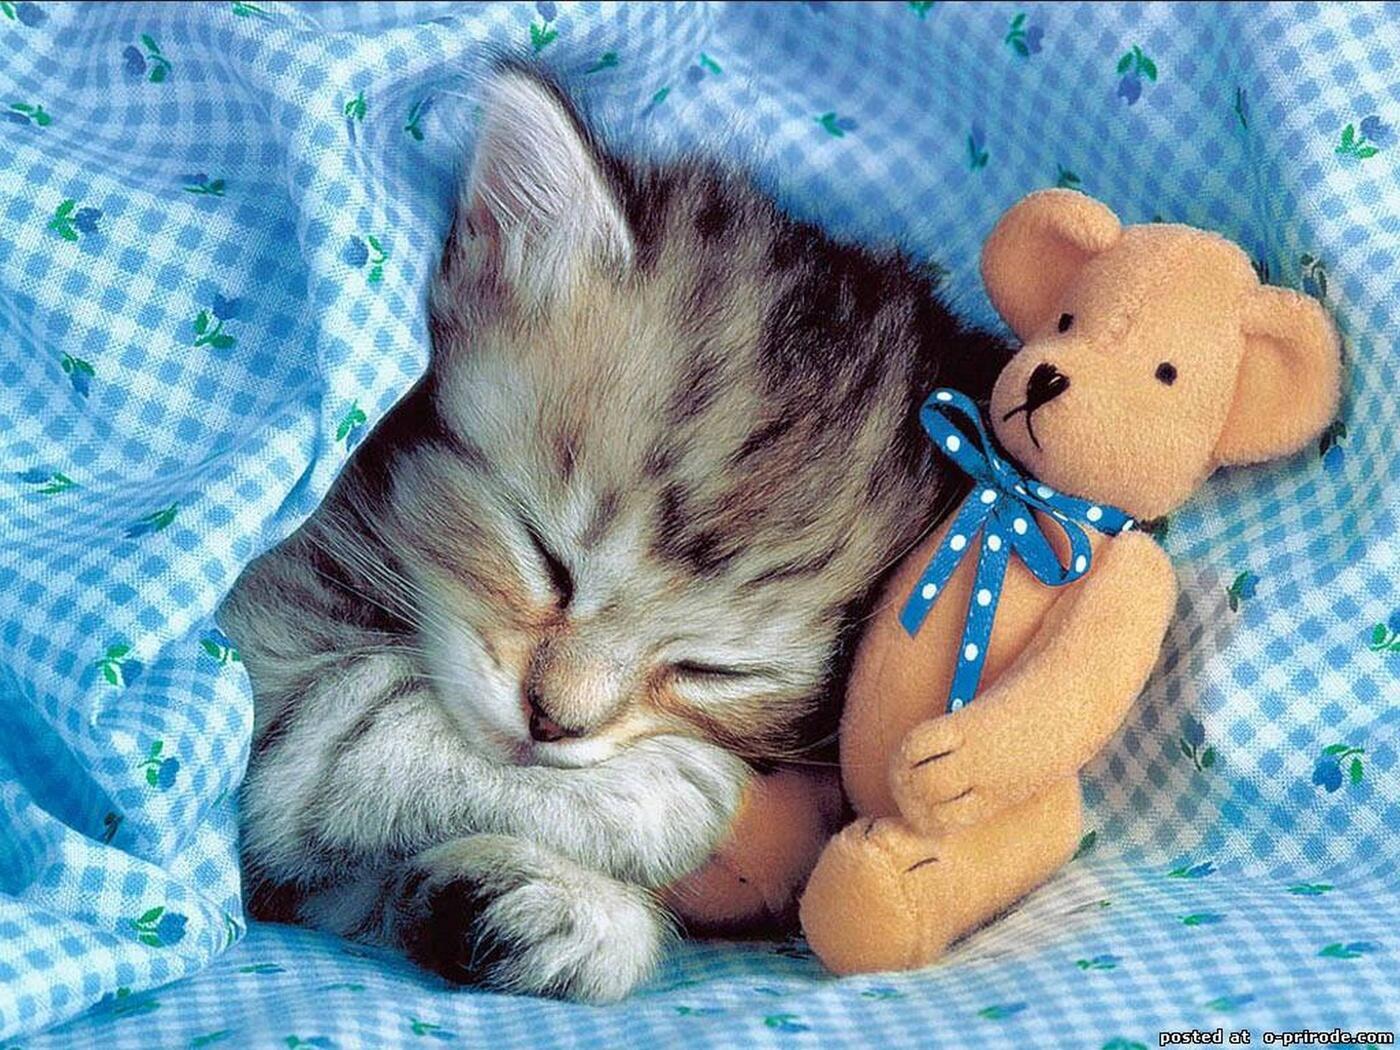 Открытки приятных сновидений с котятами, открытки елочки